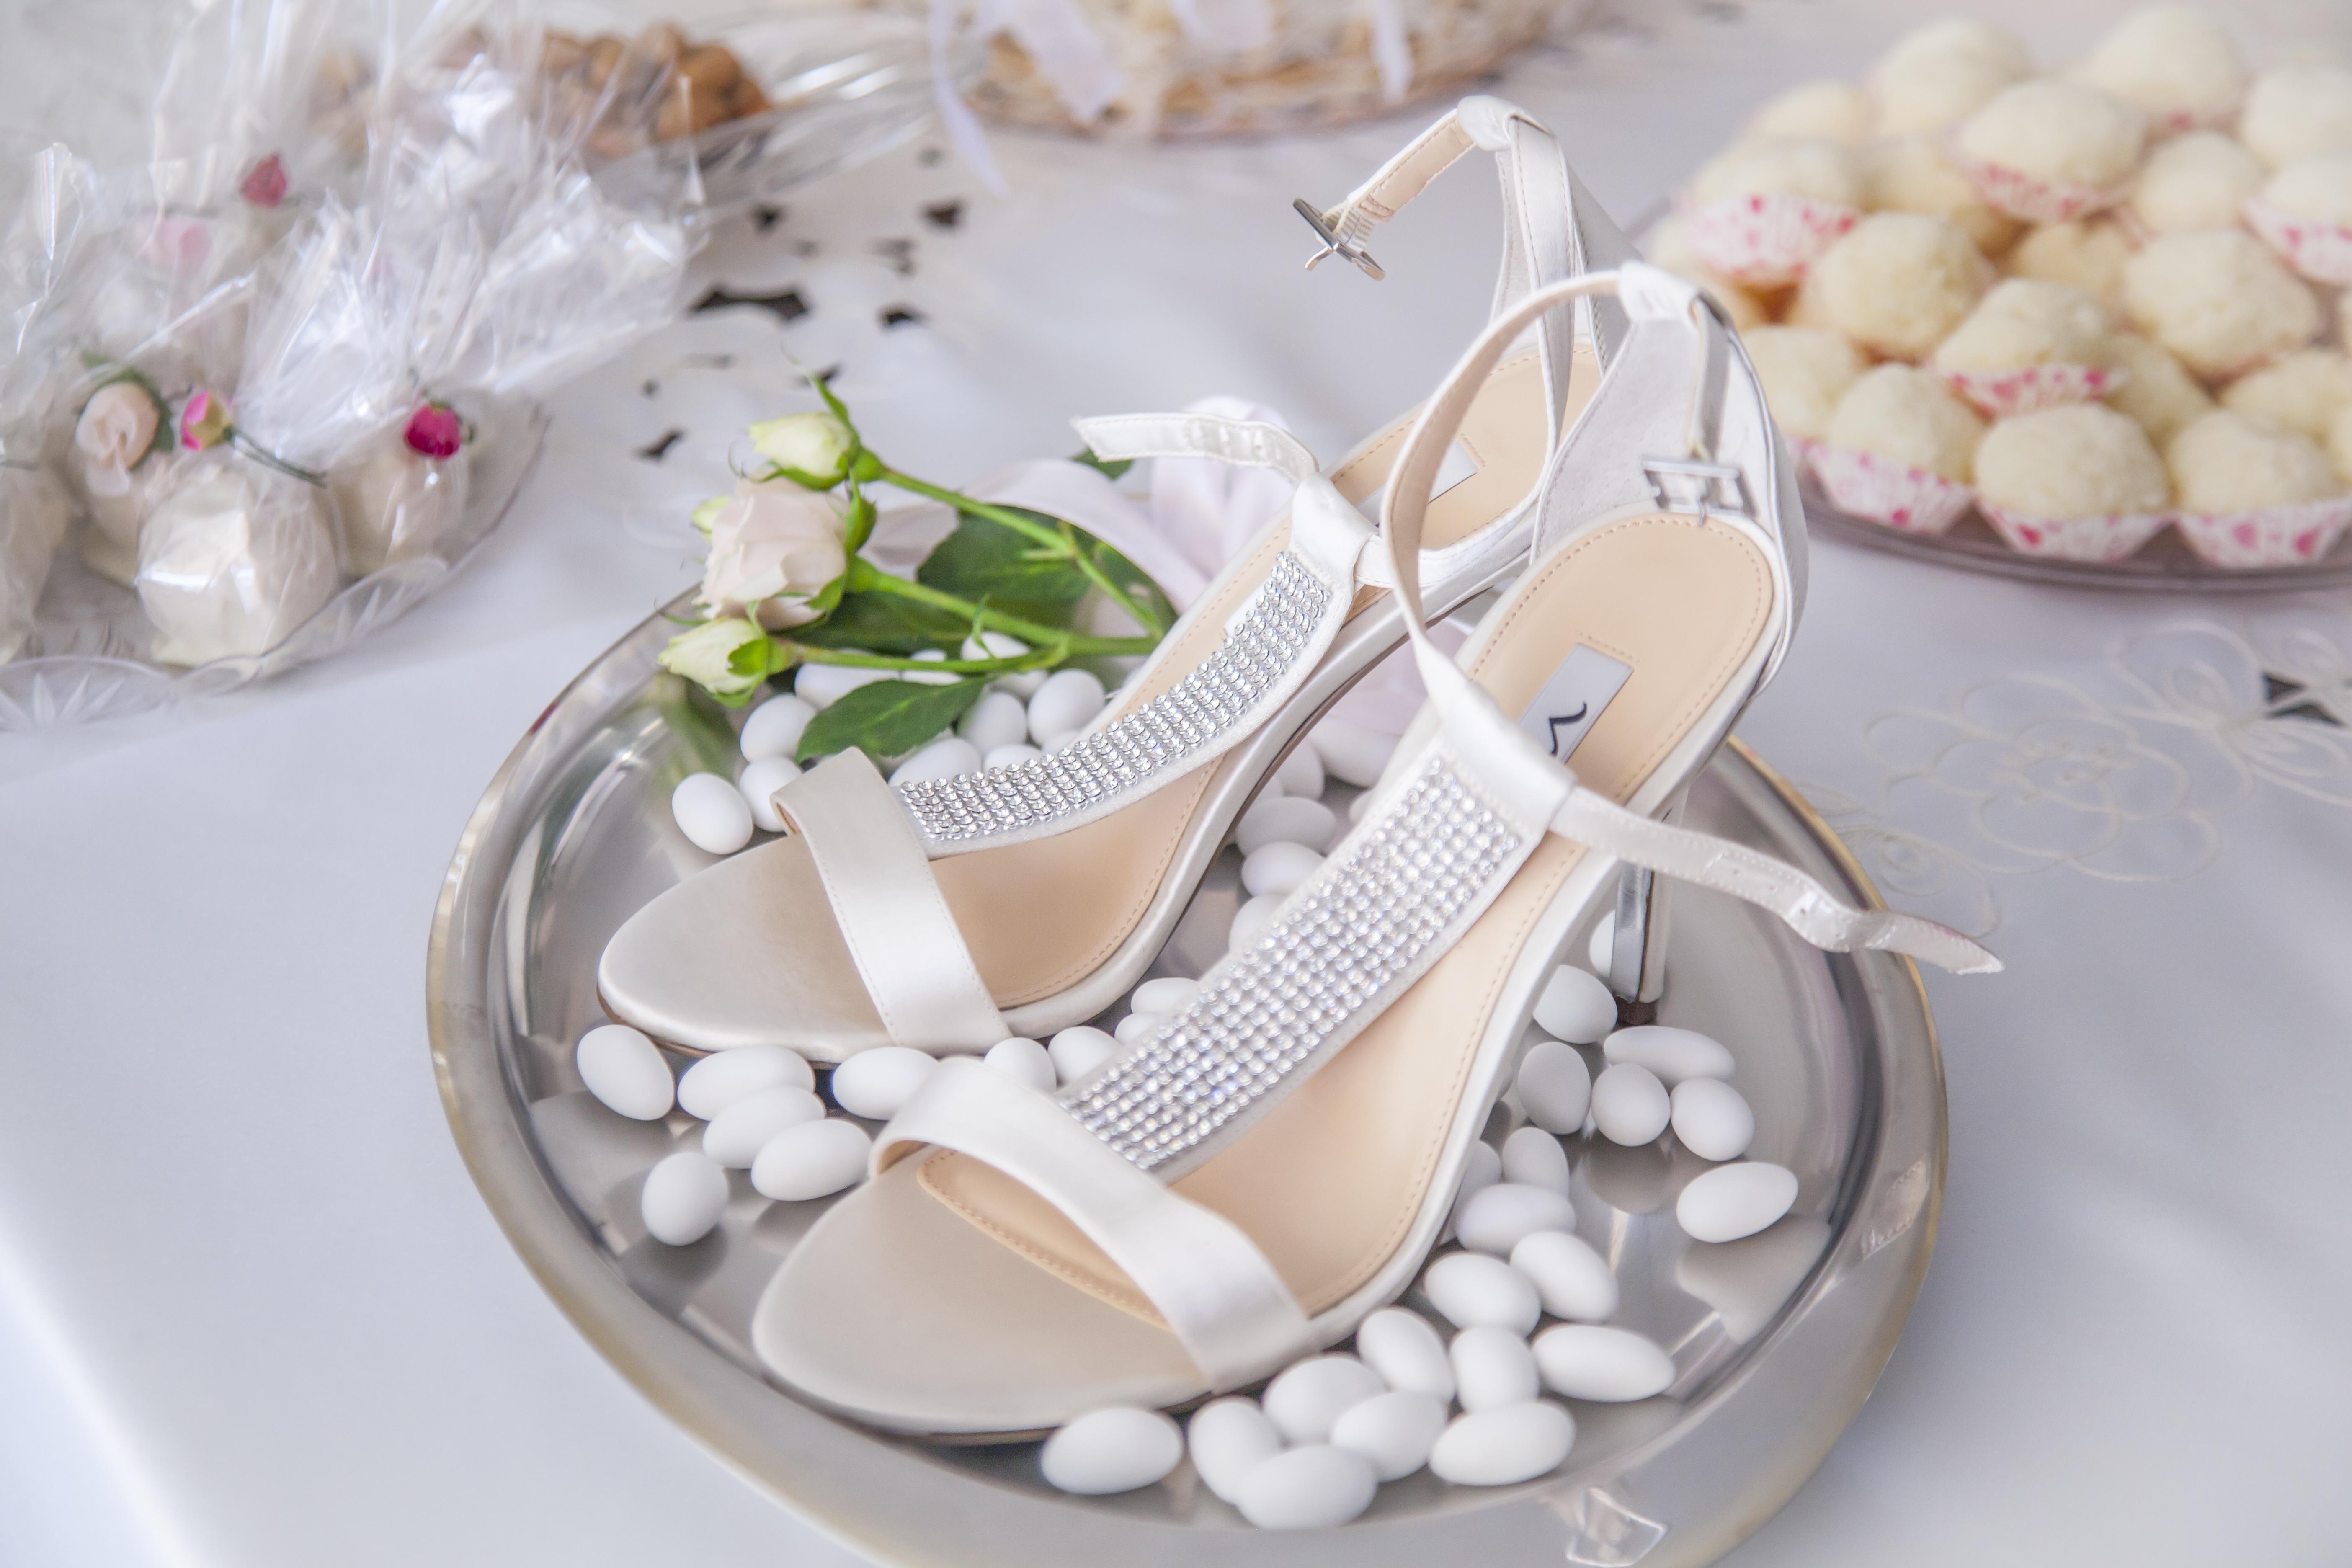 Free Images : table, heel, shoe, white, flower, petal, food, dessert ...